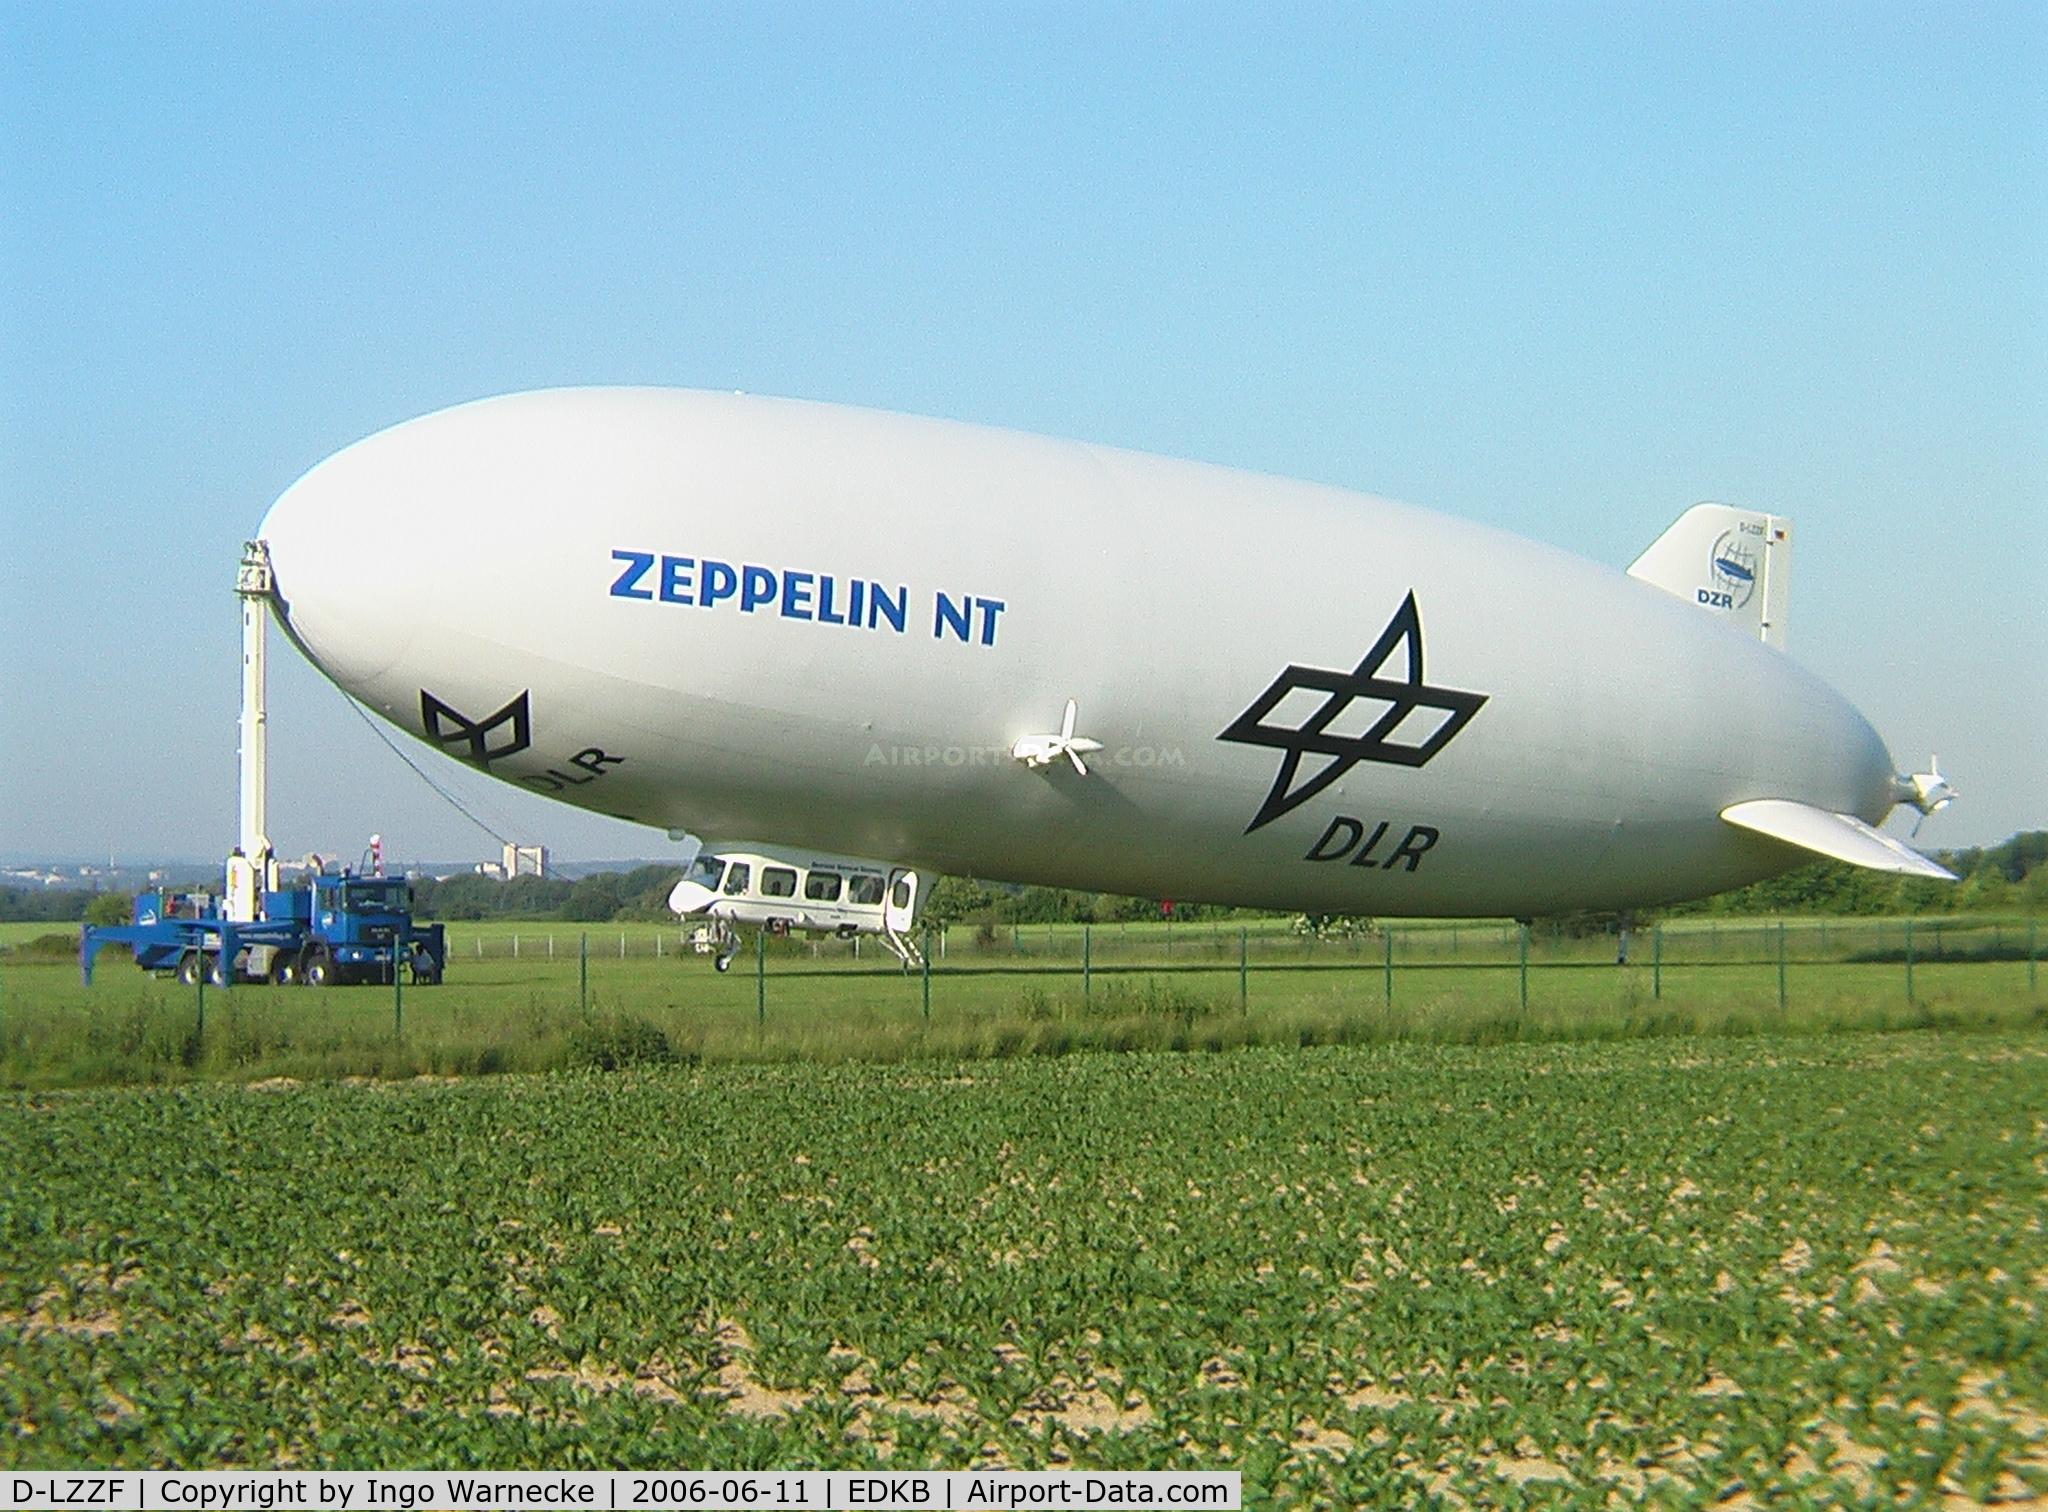 D-LZZF, 1998 Zeppelin LZ-N07 C/N 3, Zeppelin NT - Deutsche Zepplin Reederei / DLR at Bonn/Hangelar airfield